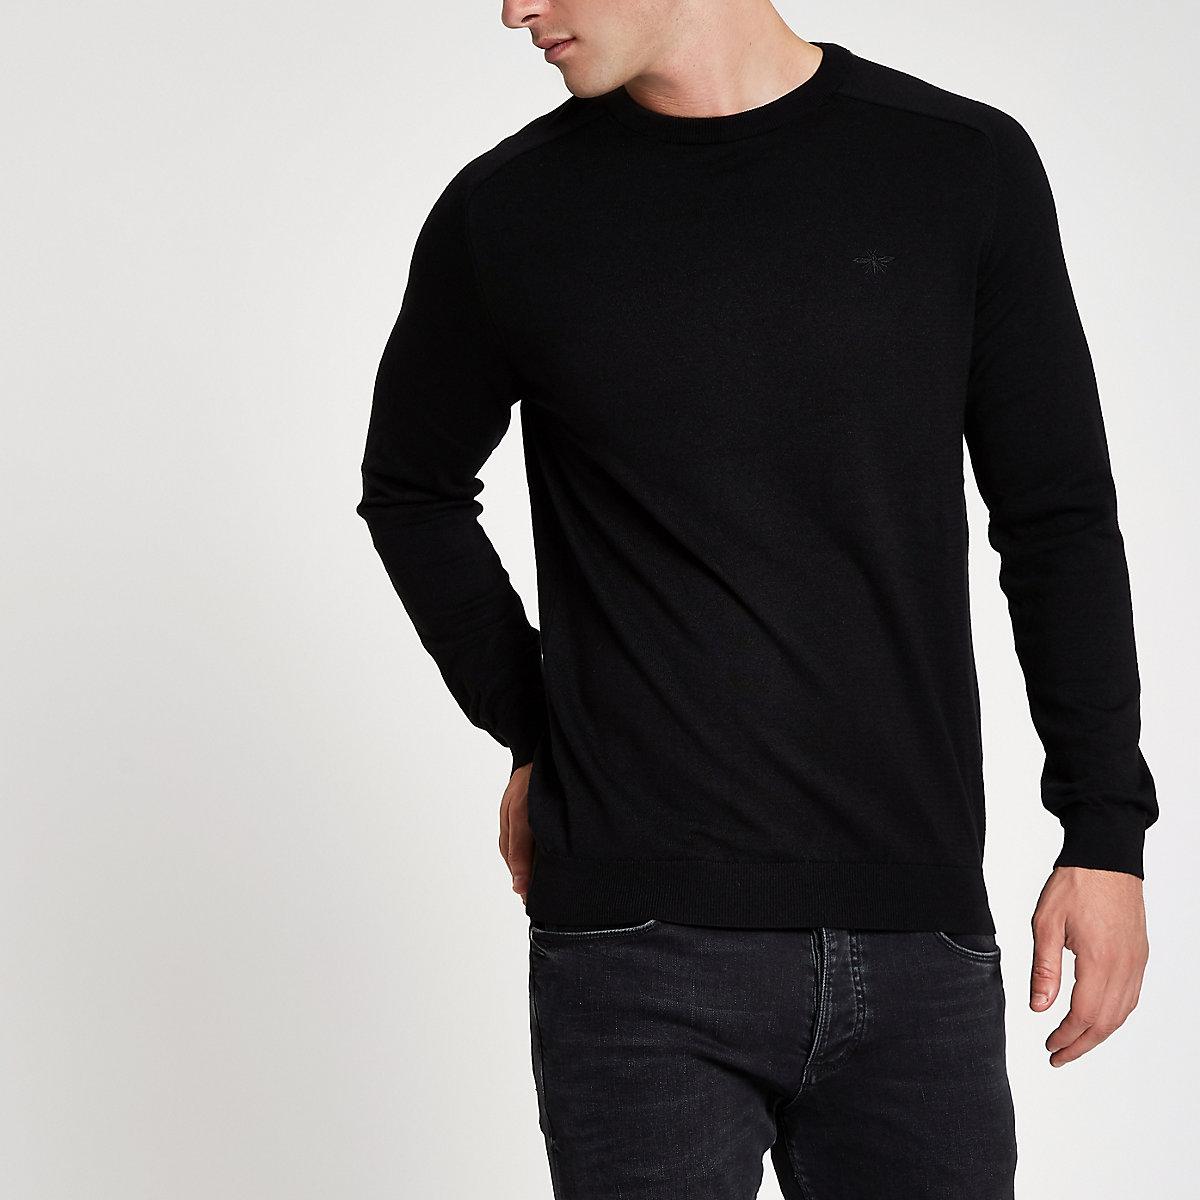 Black slim fit crew neck sweater